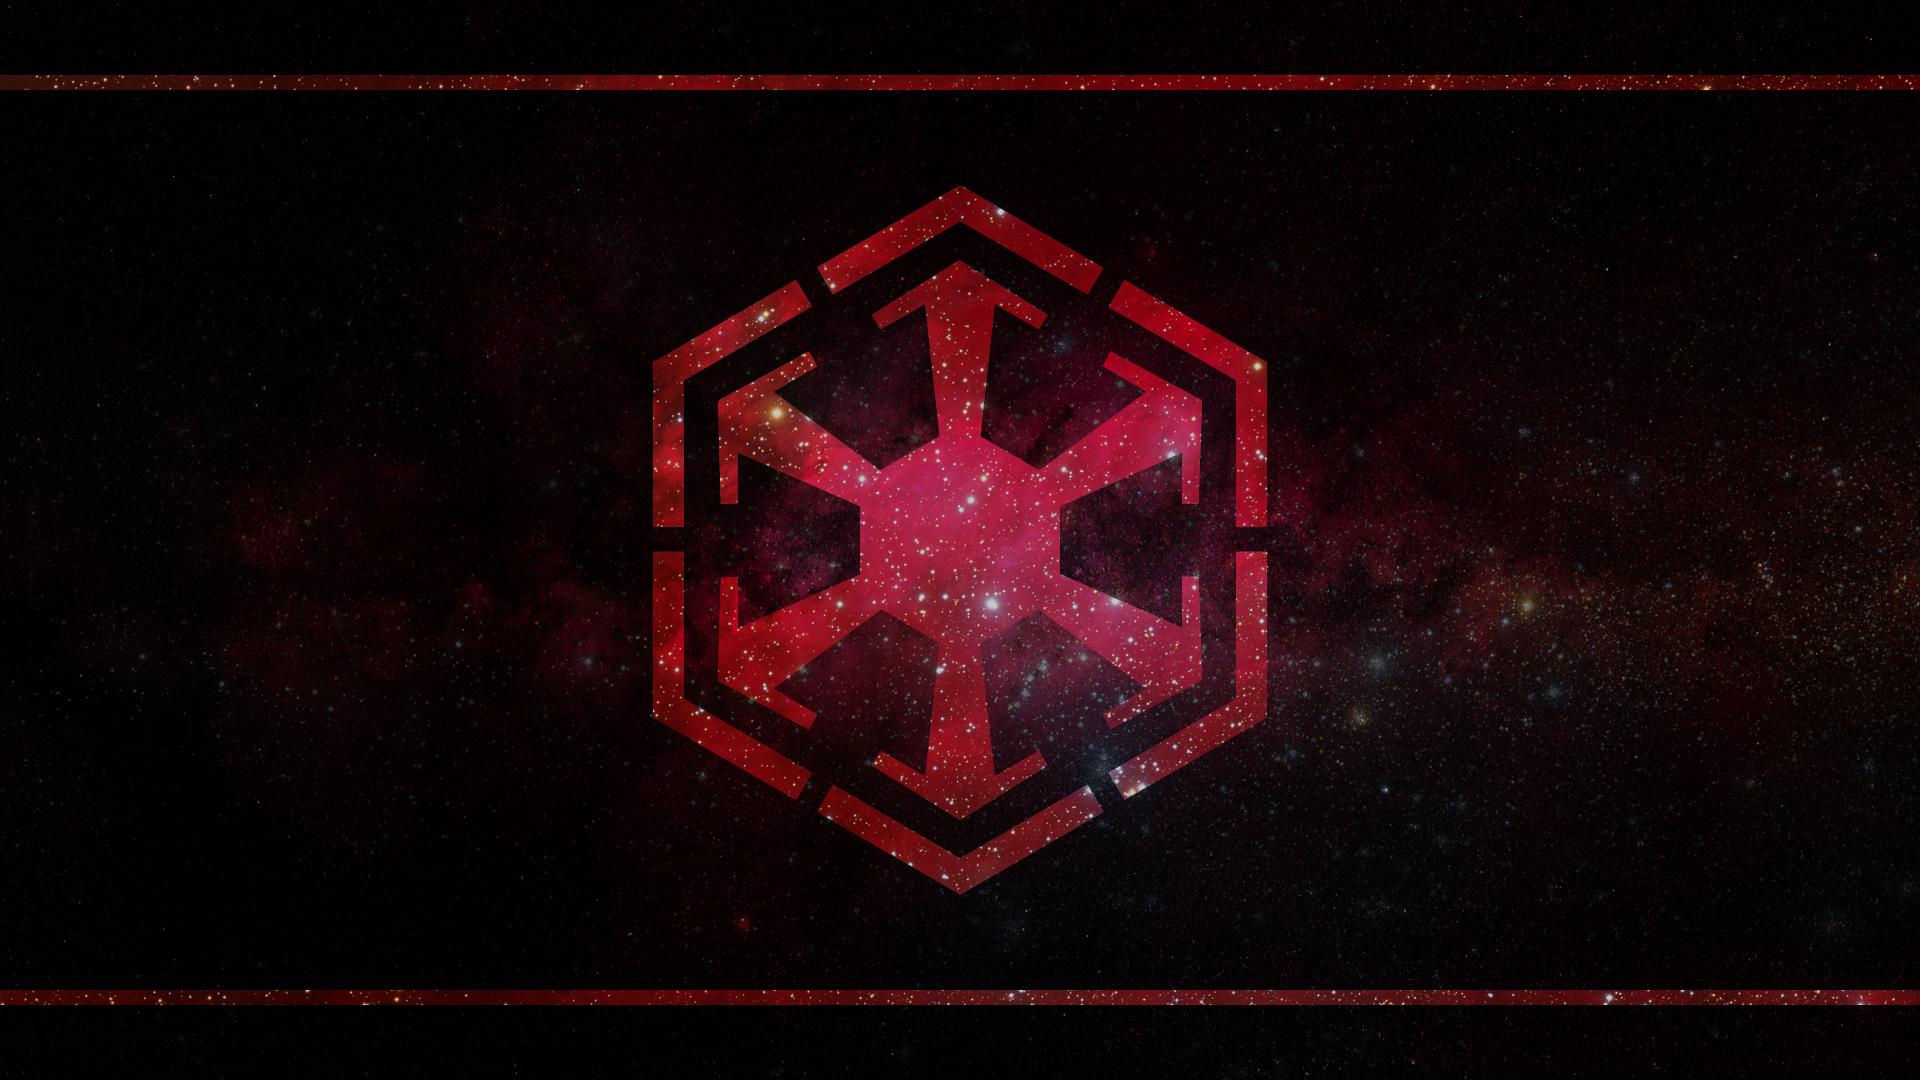 Sith Empire Desktop By Drboxhead On Deviantart